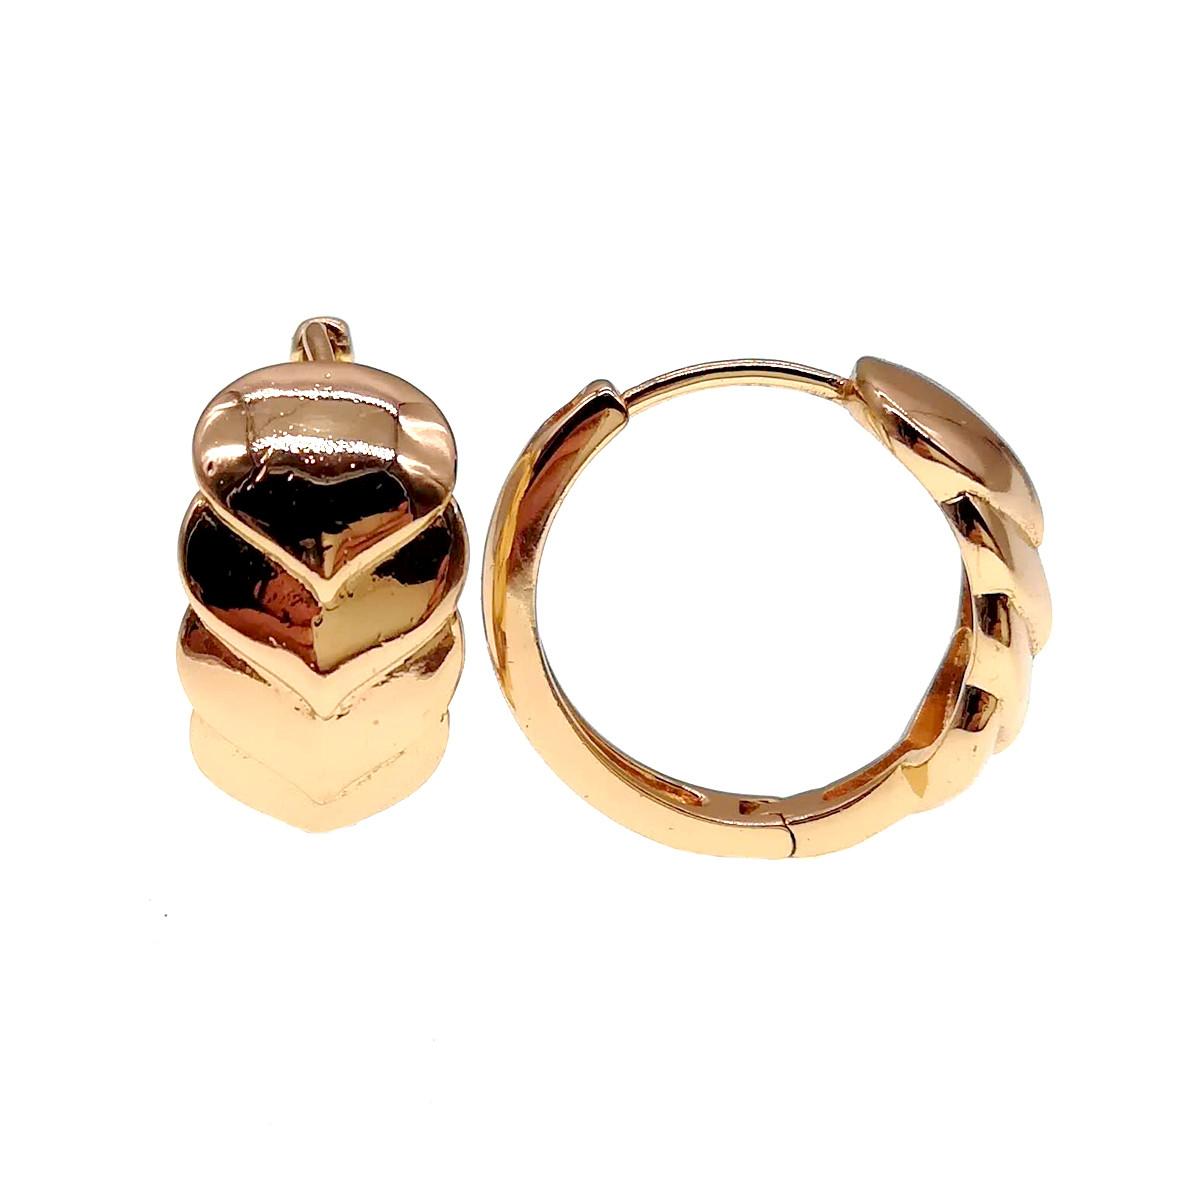 Сережки Xuping з медичного золота, позолота 18К, 23873 (1)